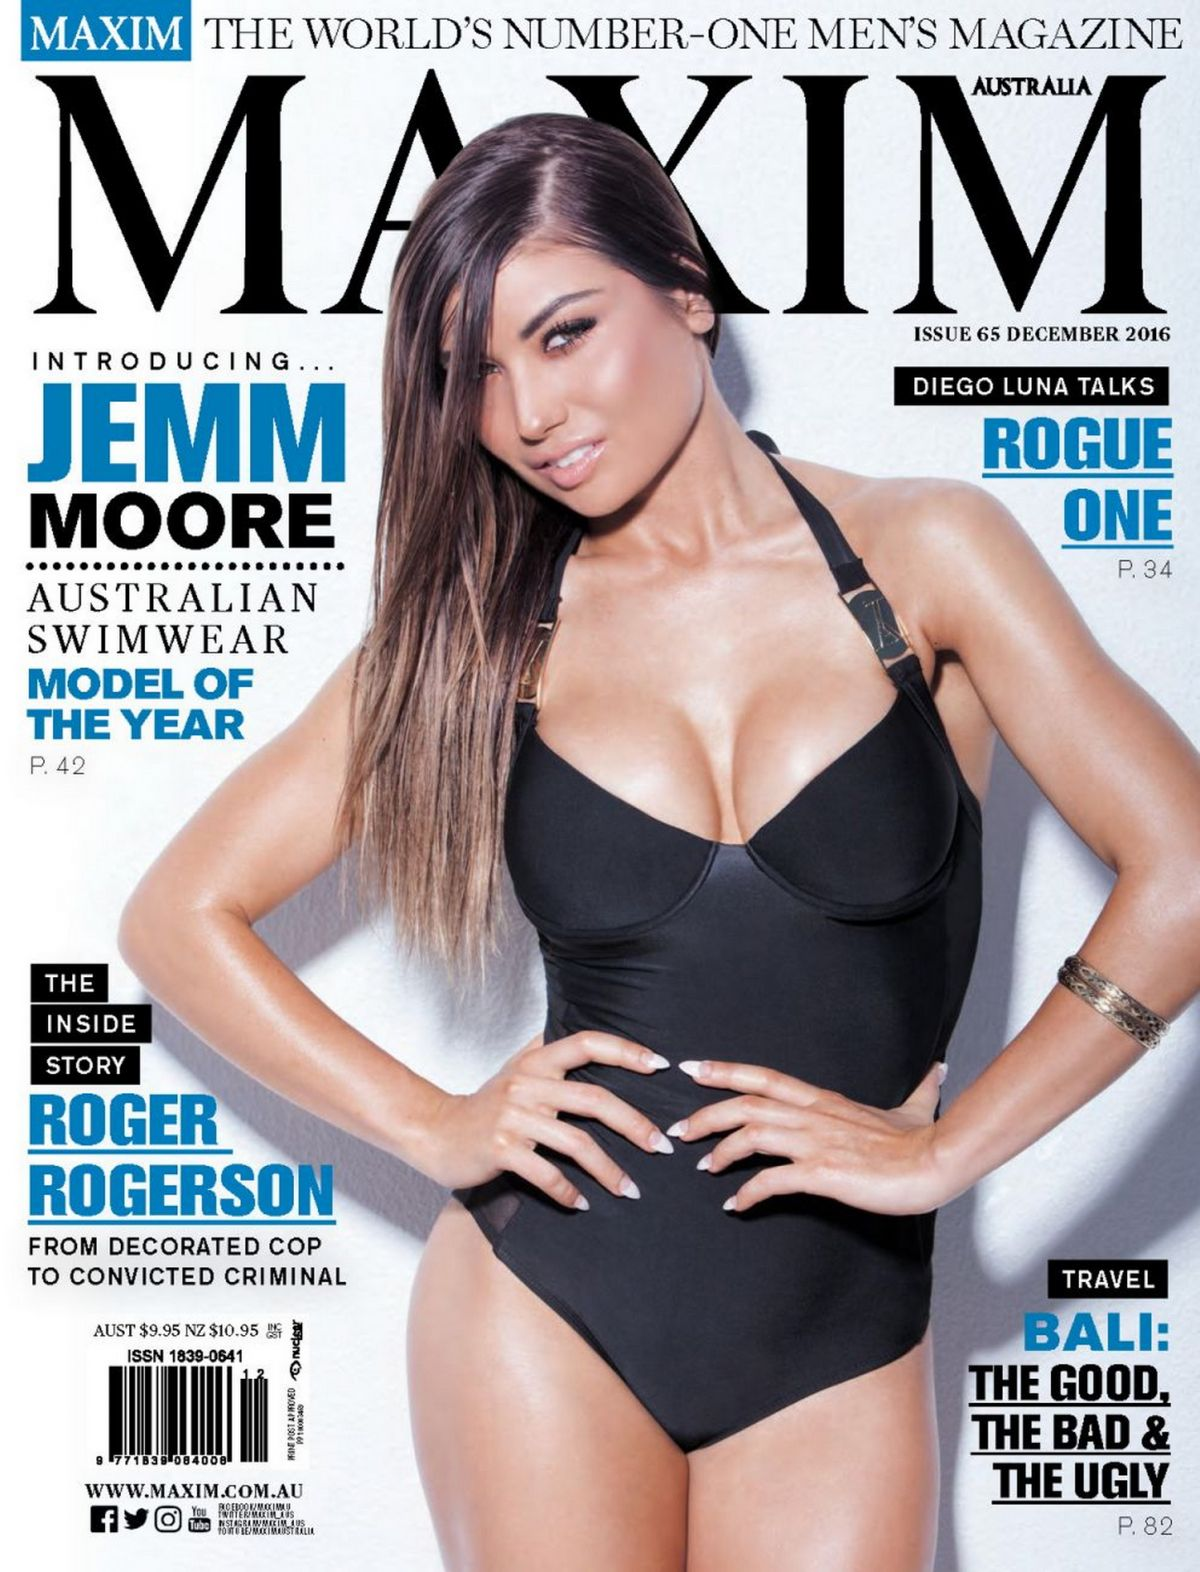 JEMM MOORE in Maxim Magazine, Australia Nnovember 2016 Issue